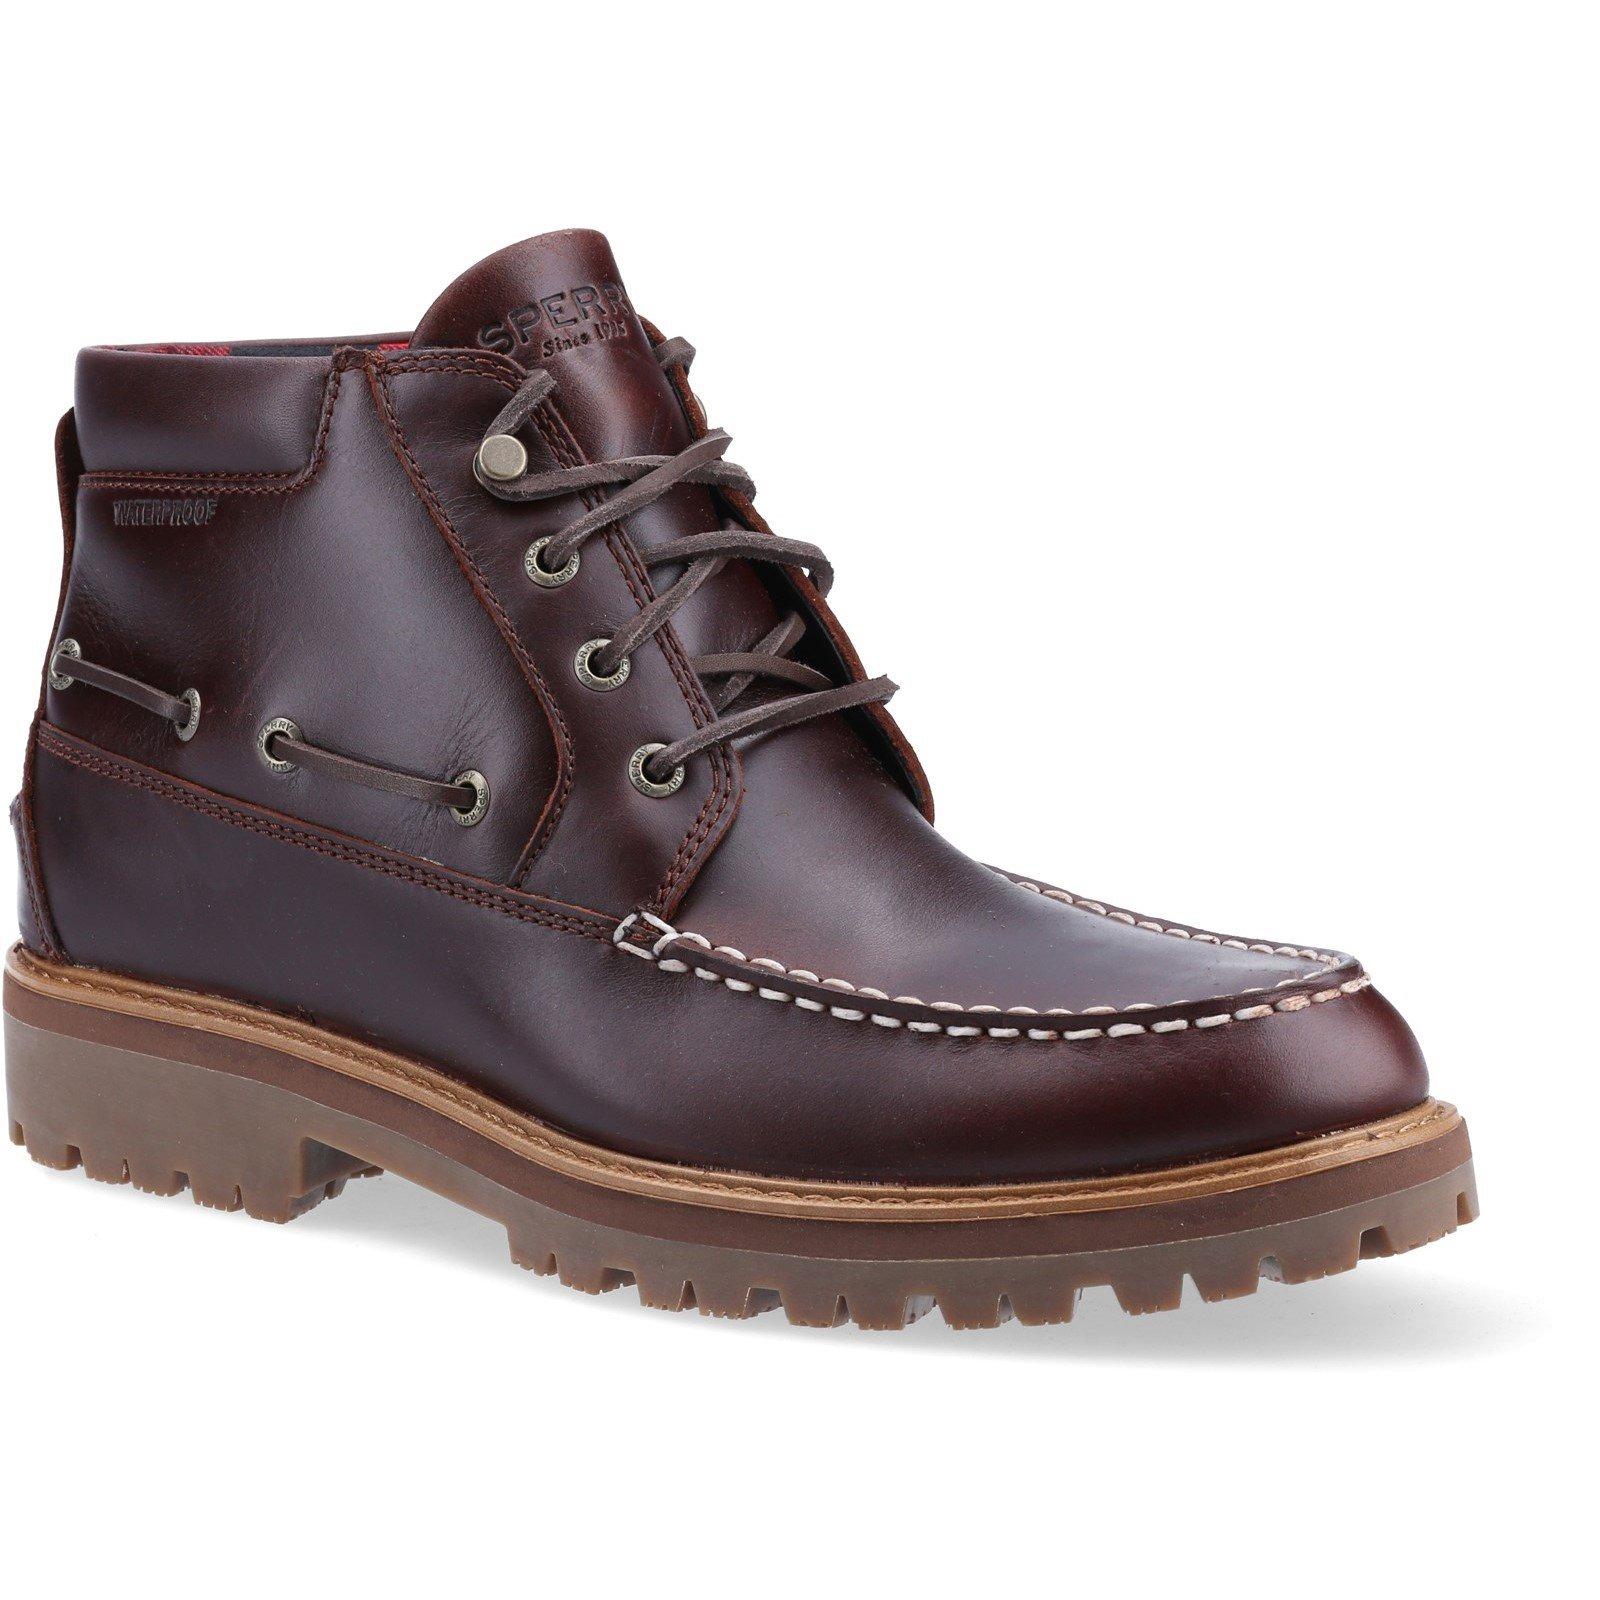 Sperry Men's Authentic Original Lug Chukka Boot Various Colours 32068 - Amaretto 8